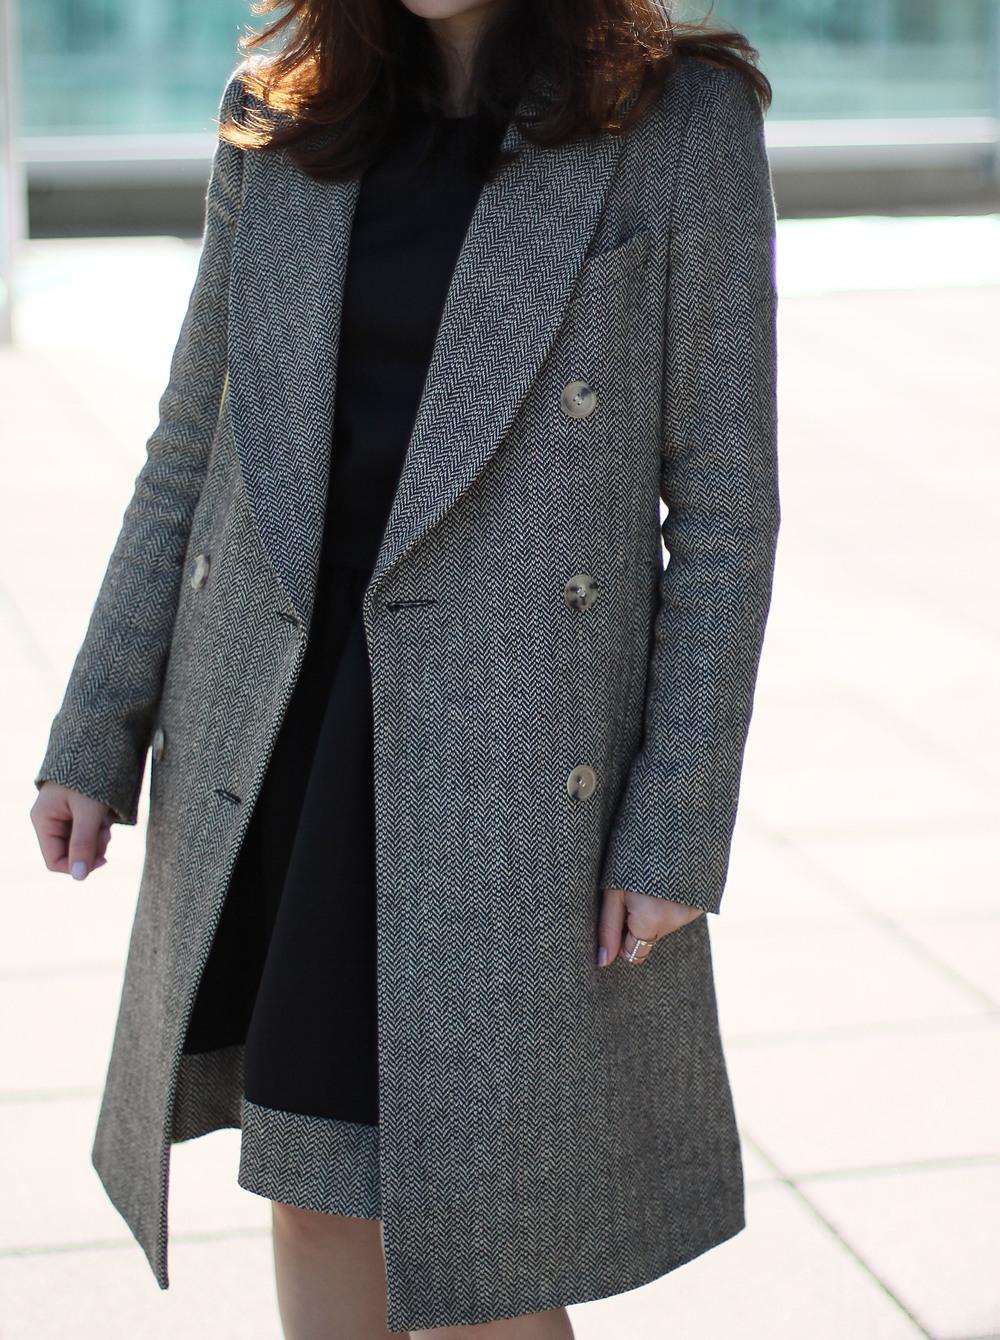 OnePointSix New York coat details.jpg